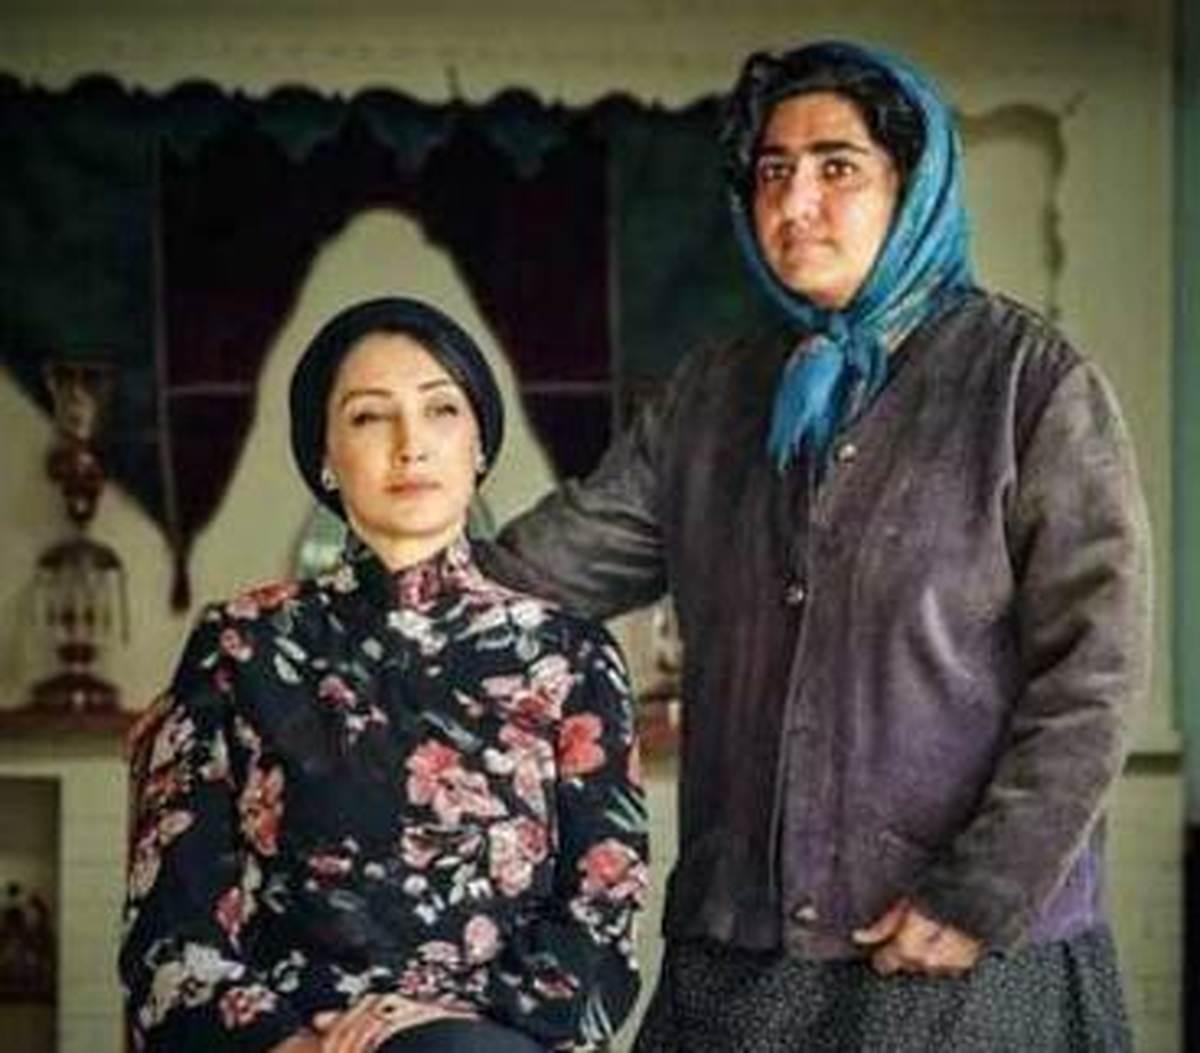 هدیه تهرانی لباس فرح را پوشید؟| واکنش کارشناس اصولگرا: فرح در لباس هدیه تهرانی